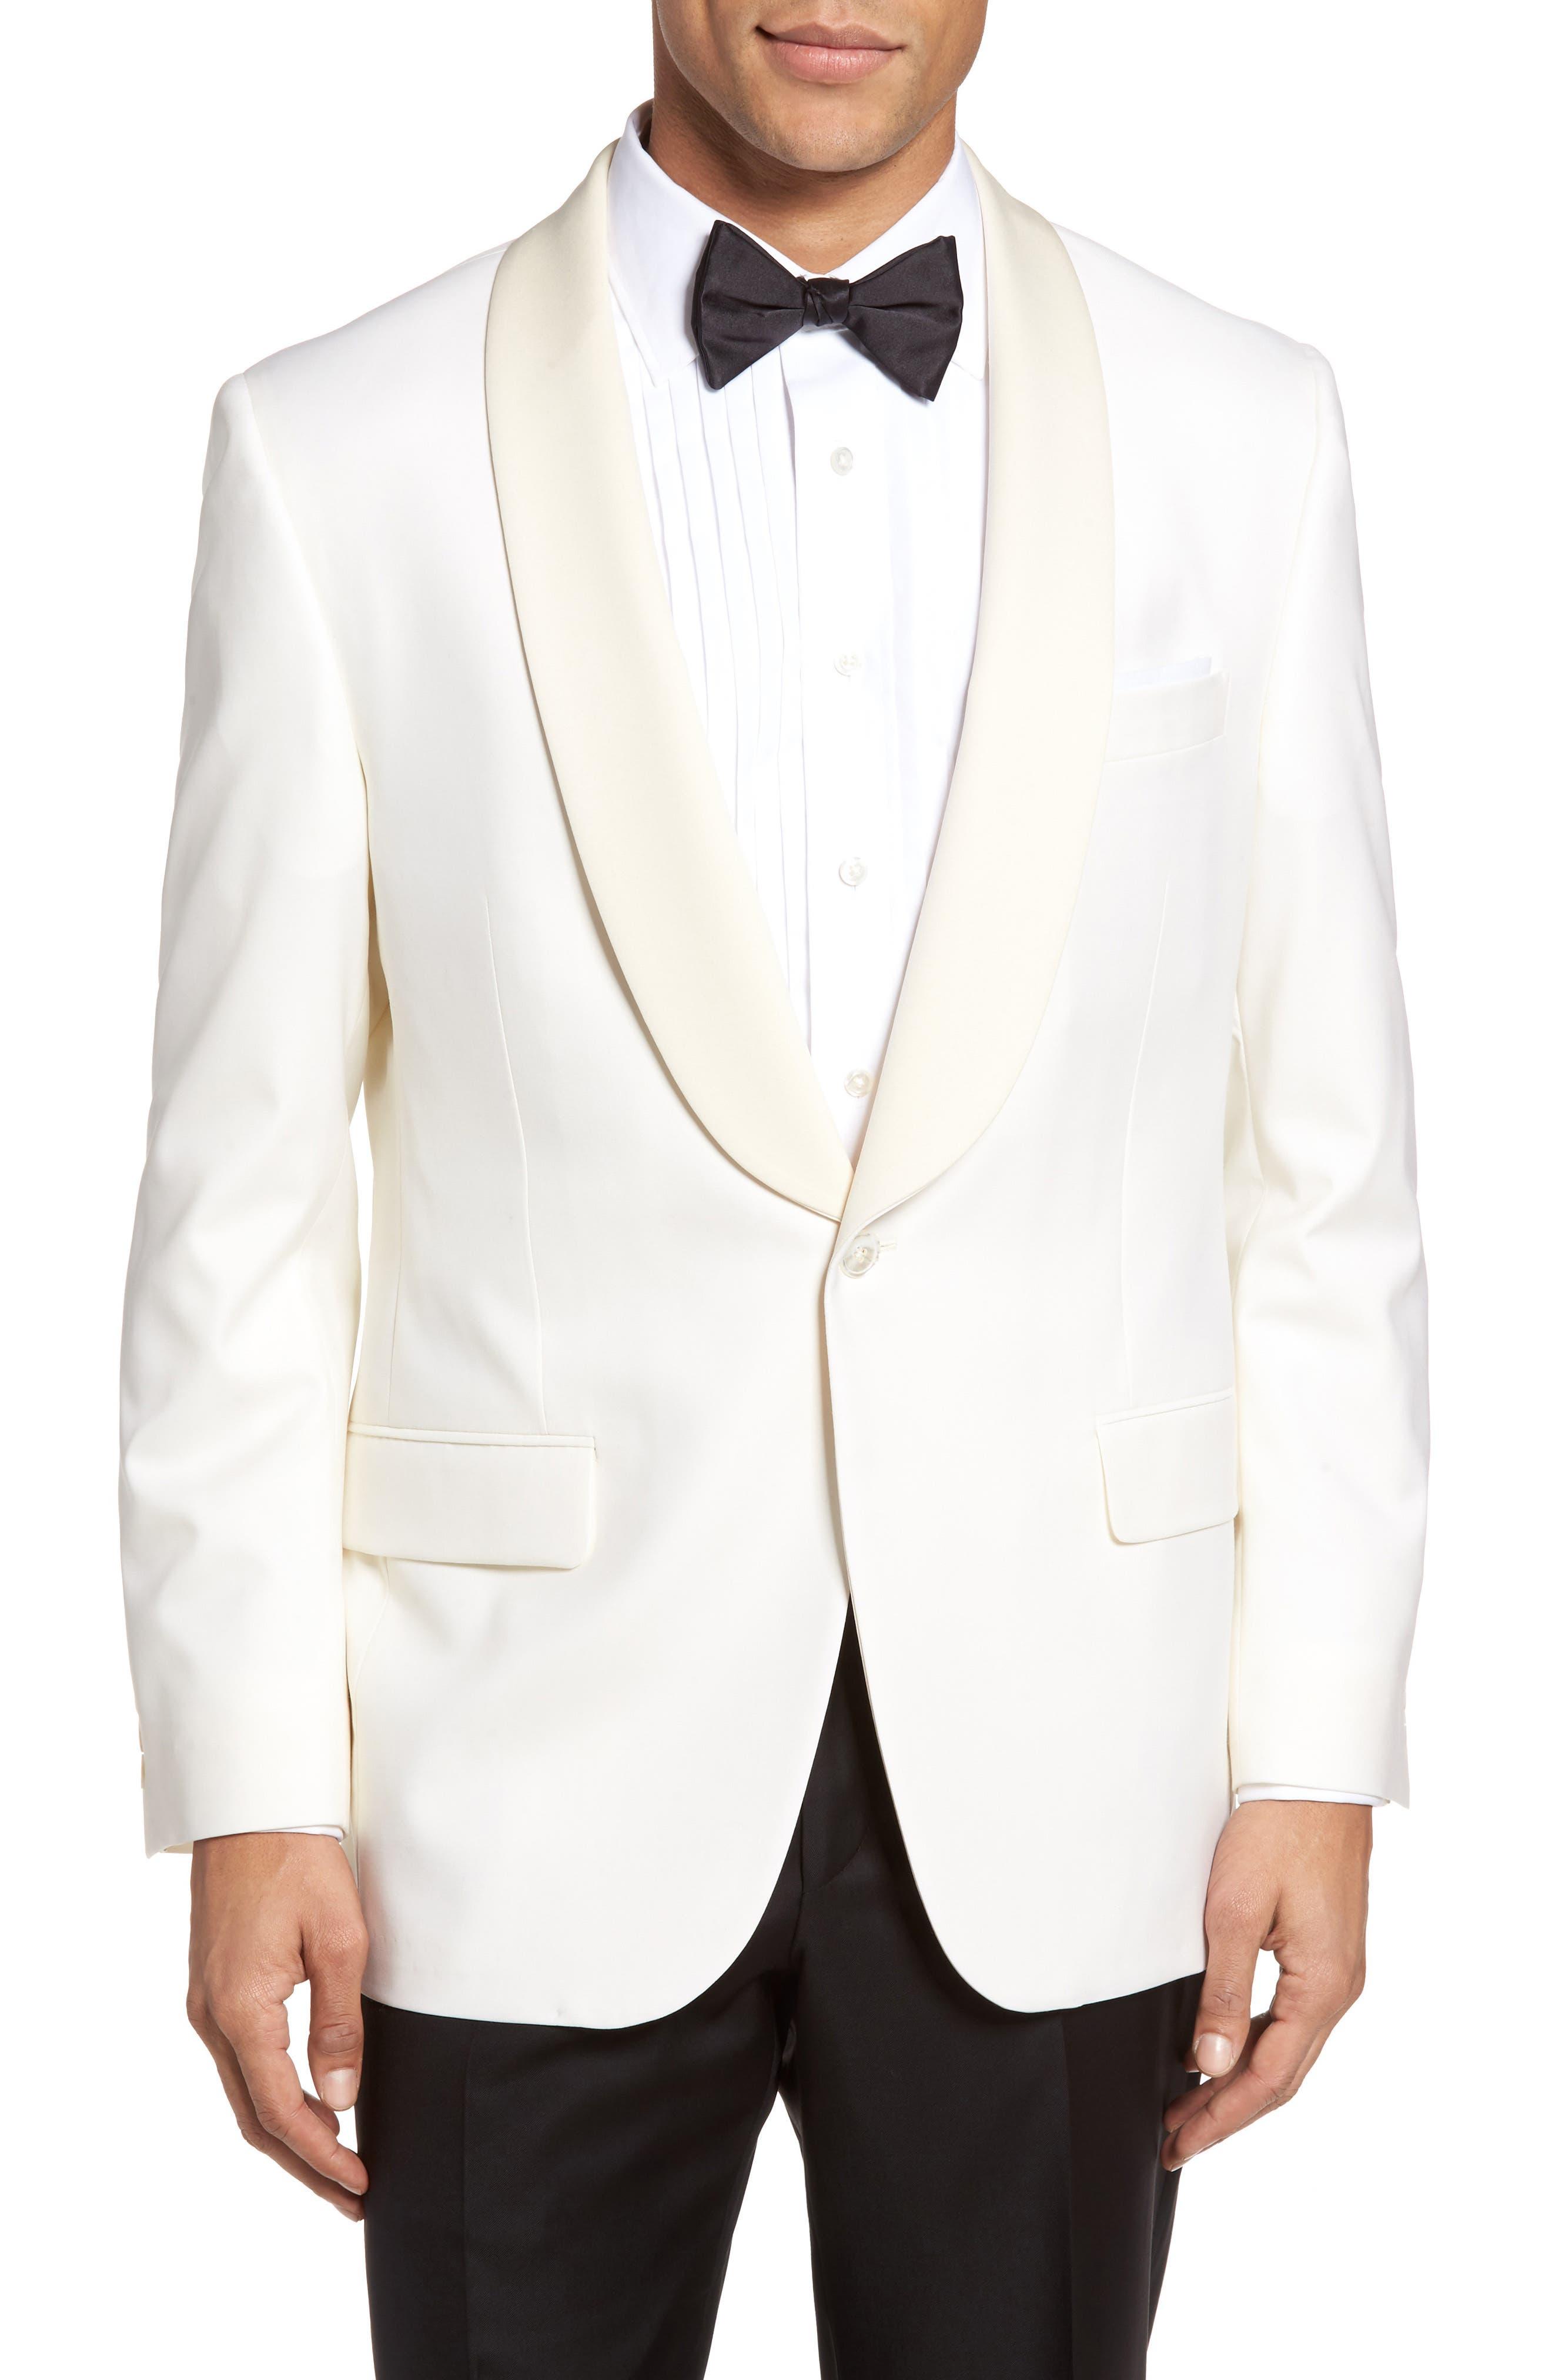 HICKEY FREEMAN Beacon Classic Fit Wool Dinner Jacket